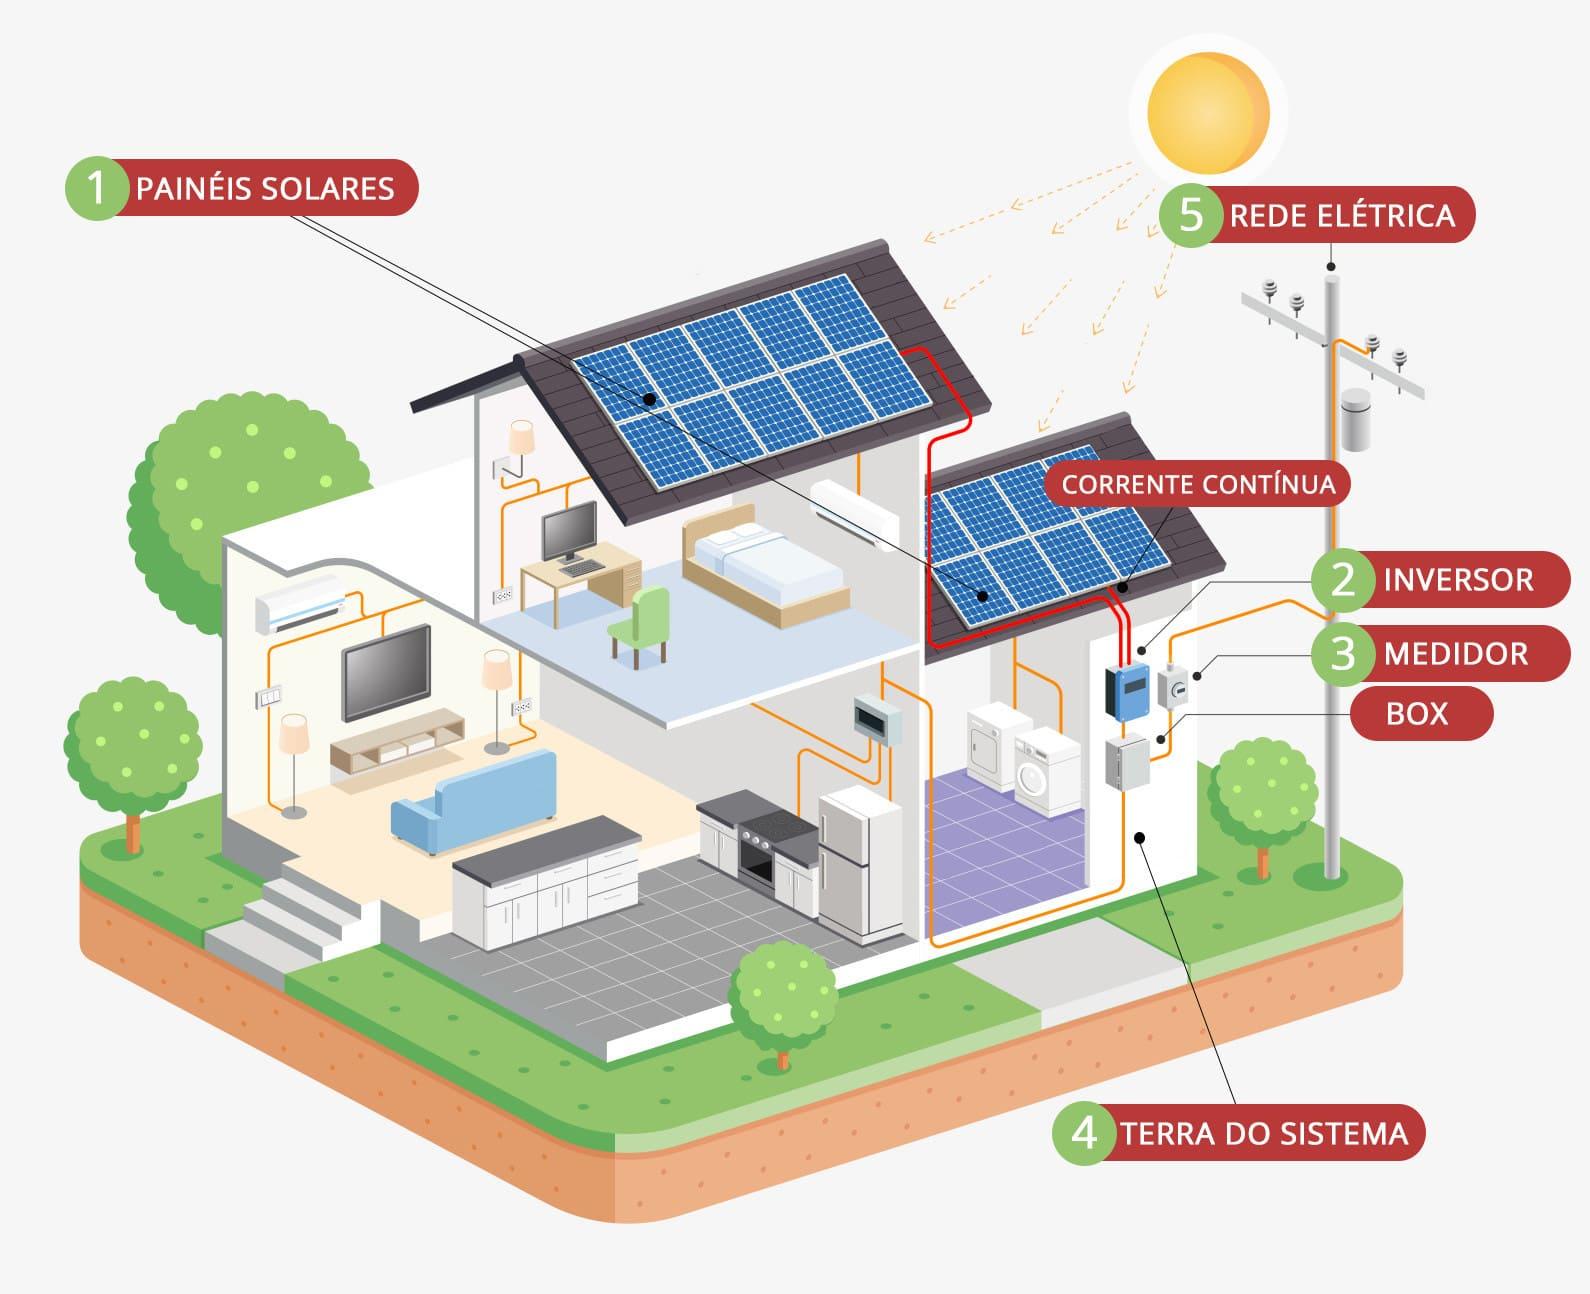 Como funciona o Sistema de Energia Fotovoltaica